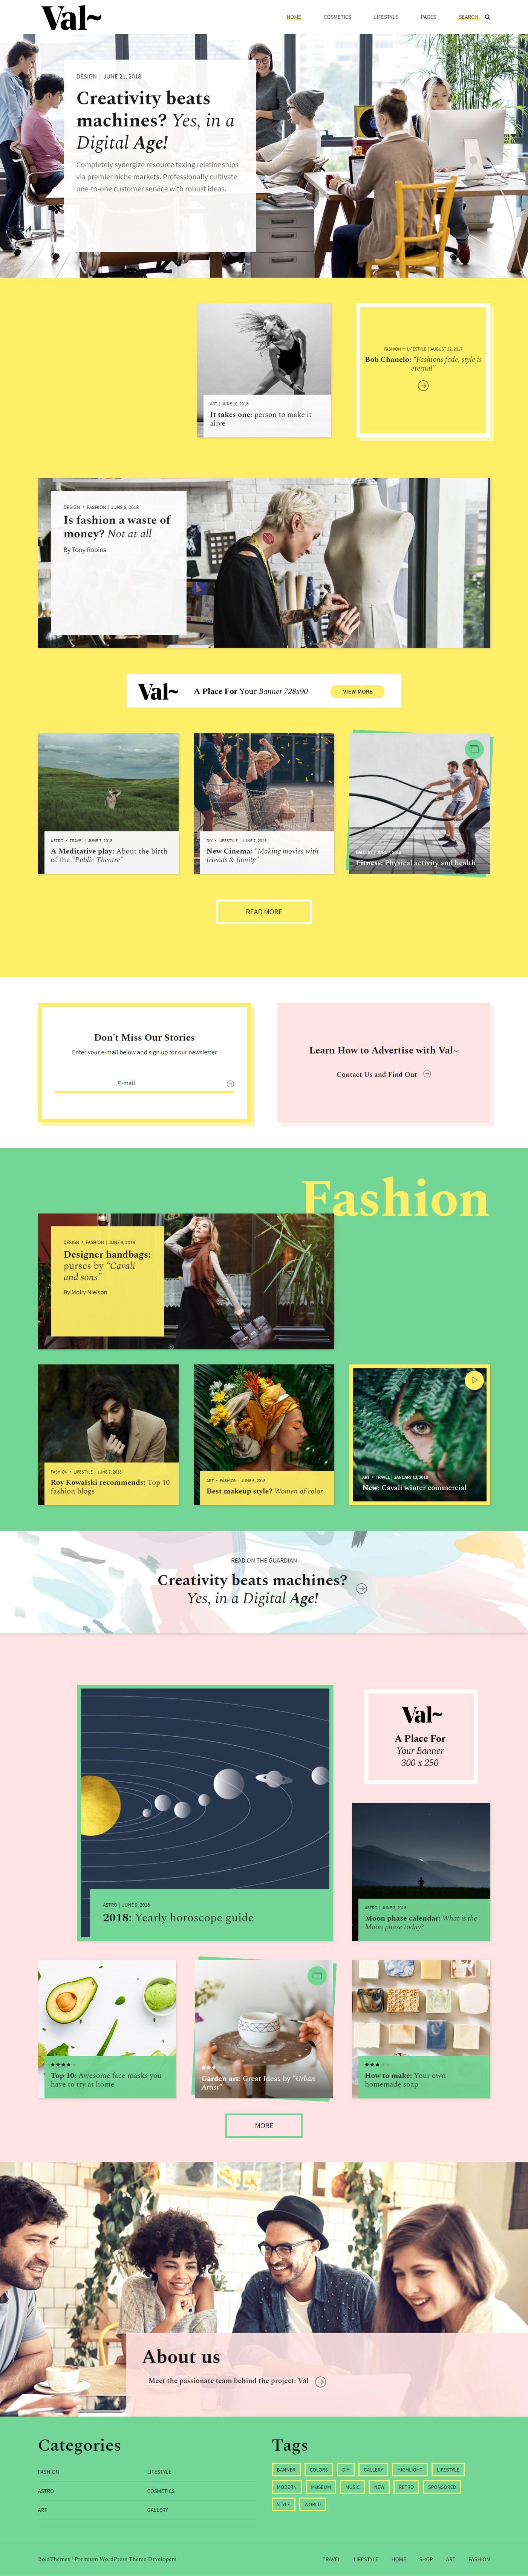 https://val.bold-themes.com/wp-content/uploads/2018/10/Green-Demo-–-Wide-Slider-Home.jpg